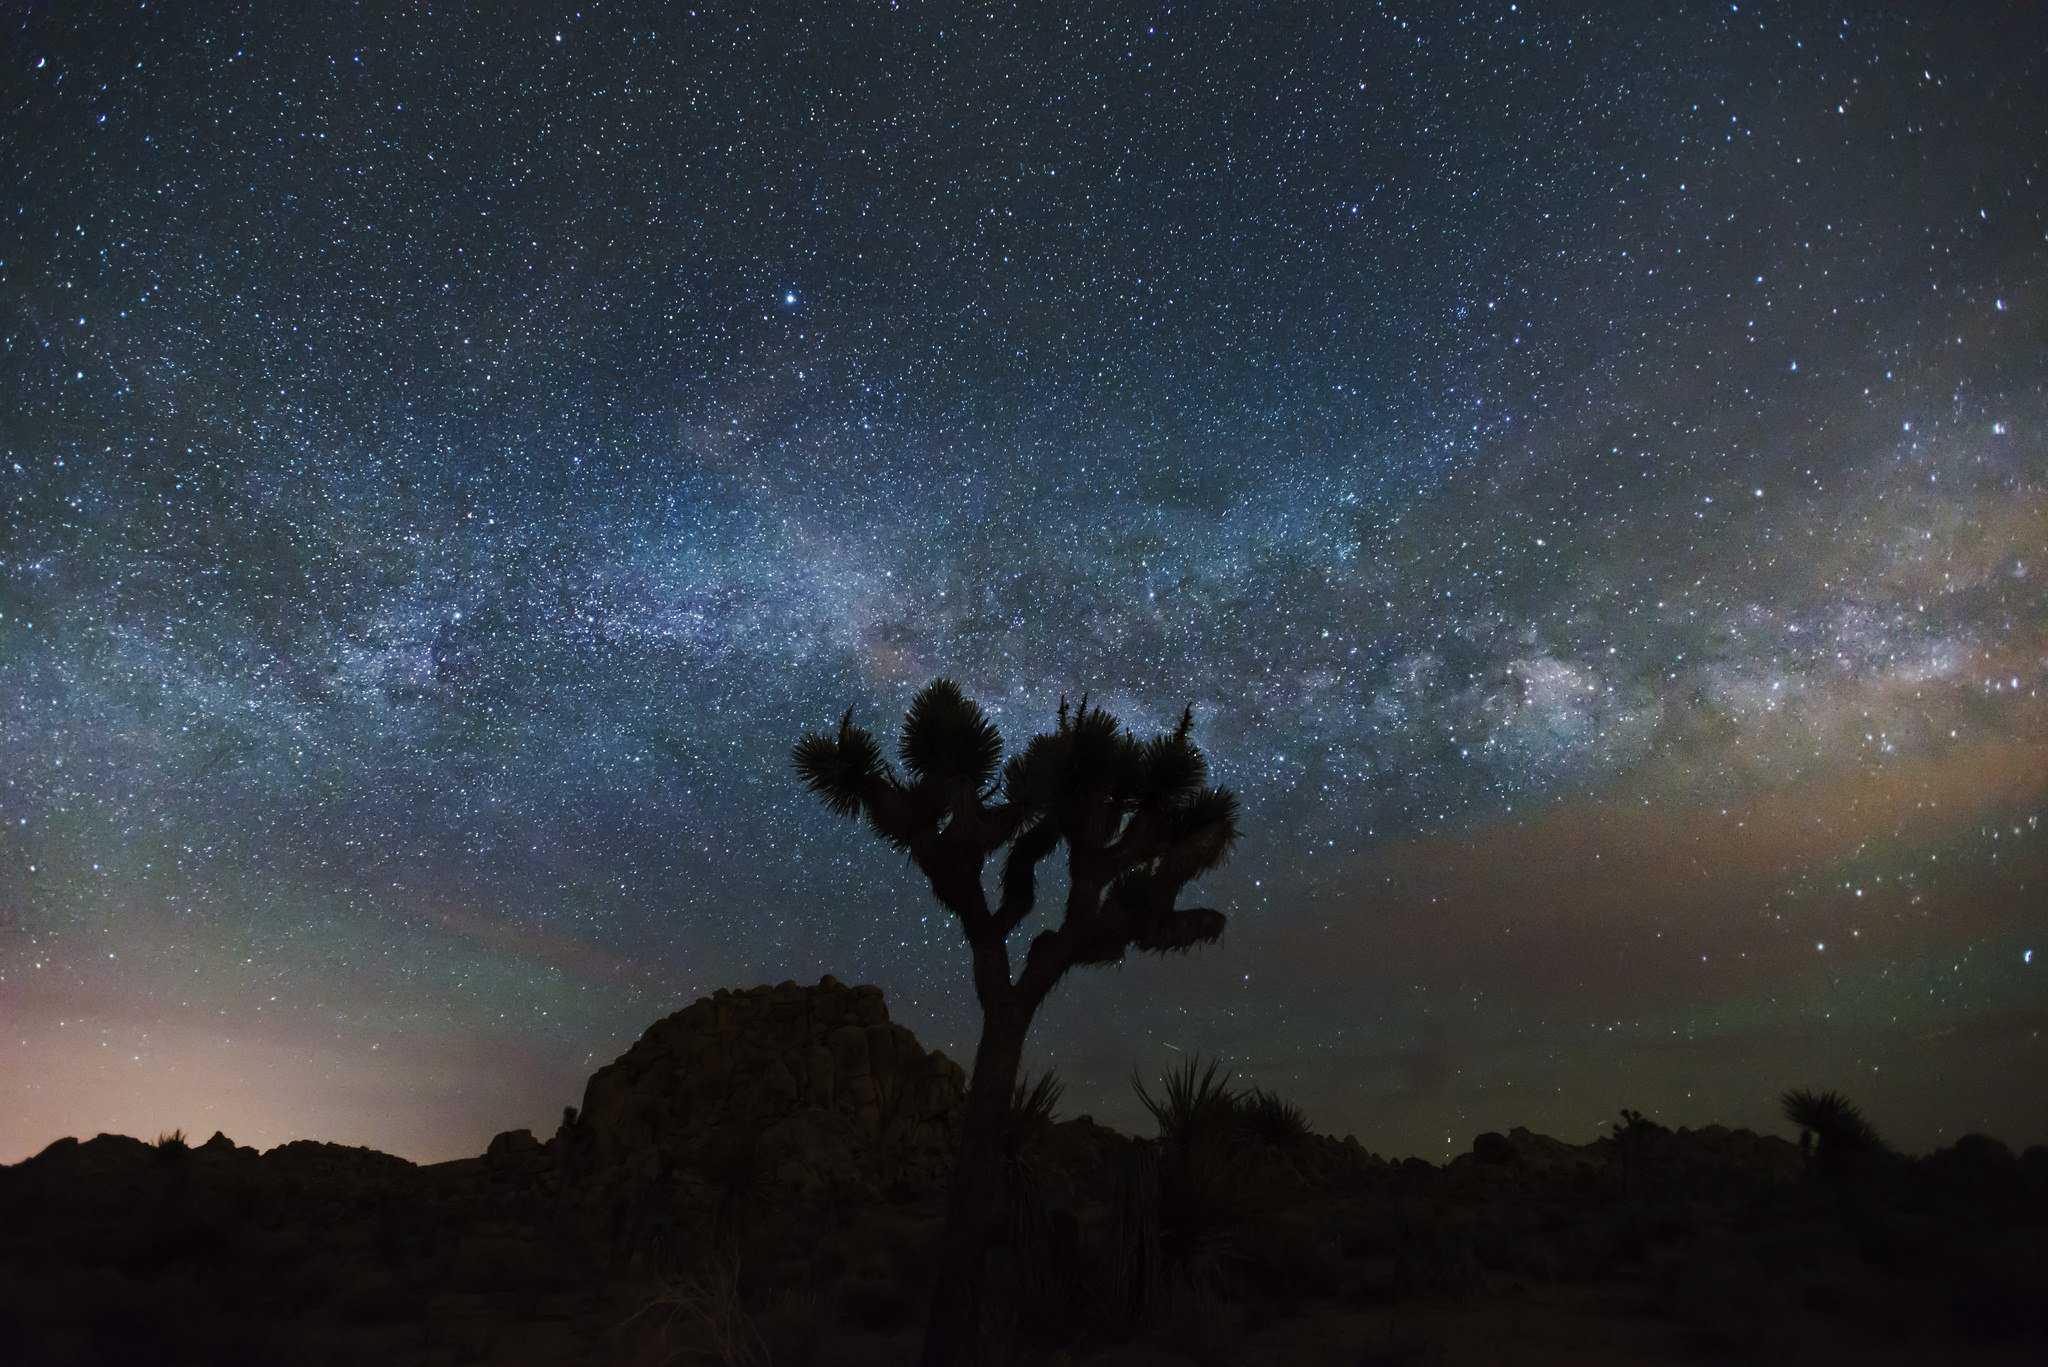 Milky Way in Joshua Tree National Park - NPS/Brad Sutton